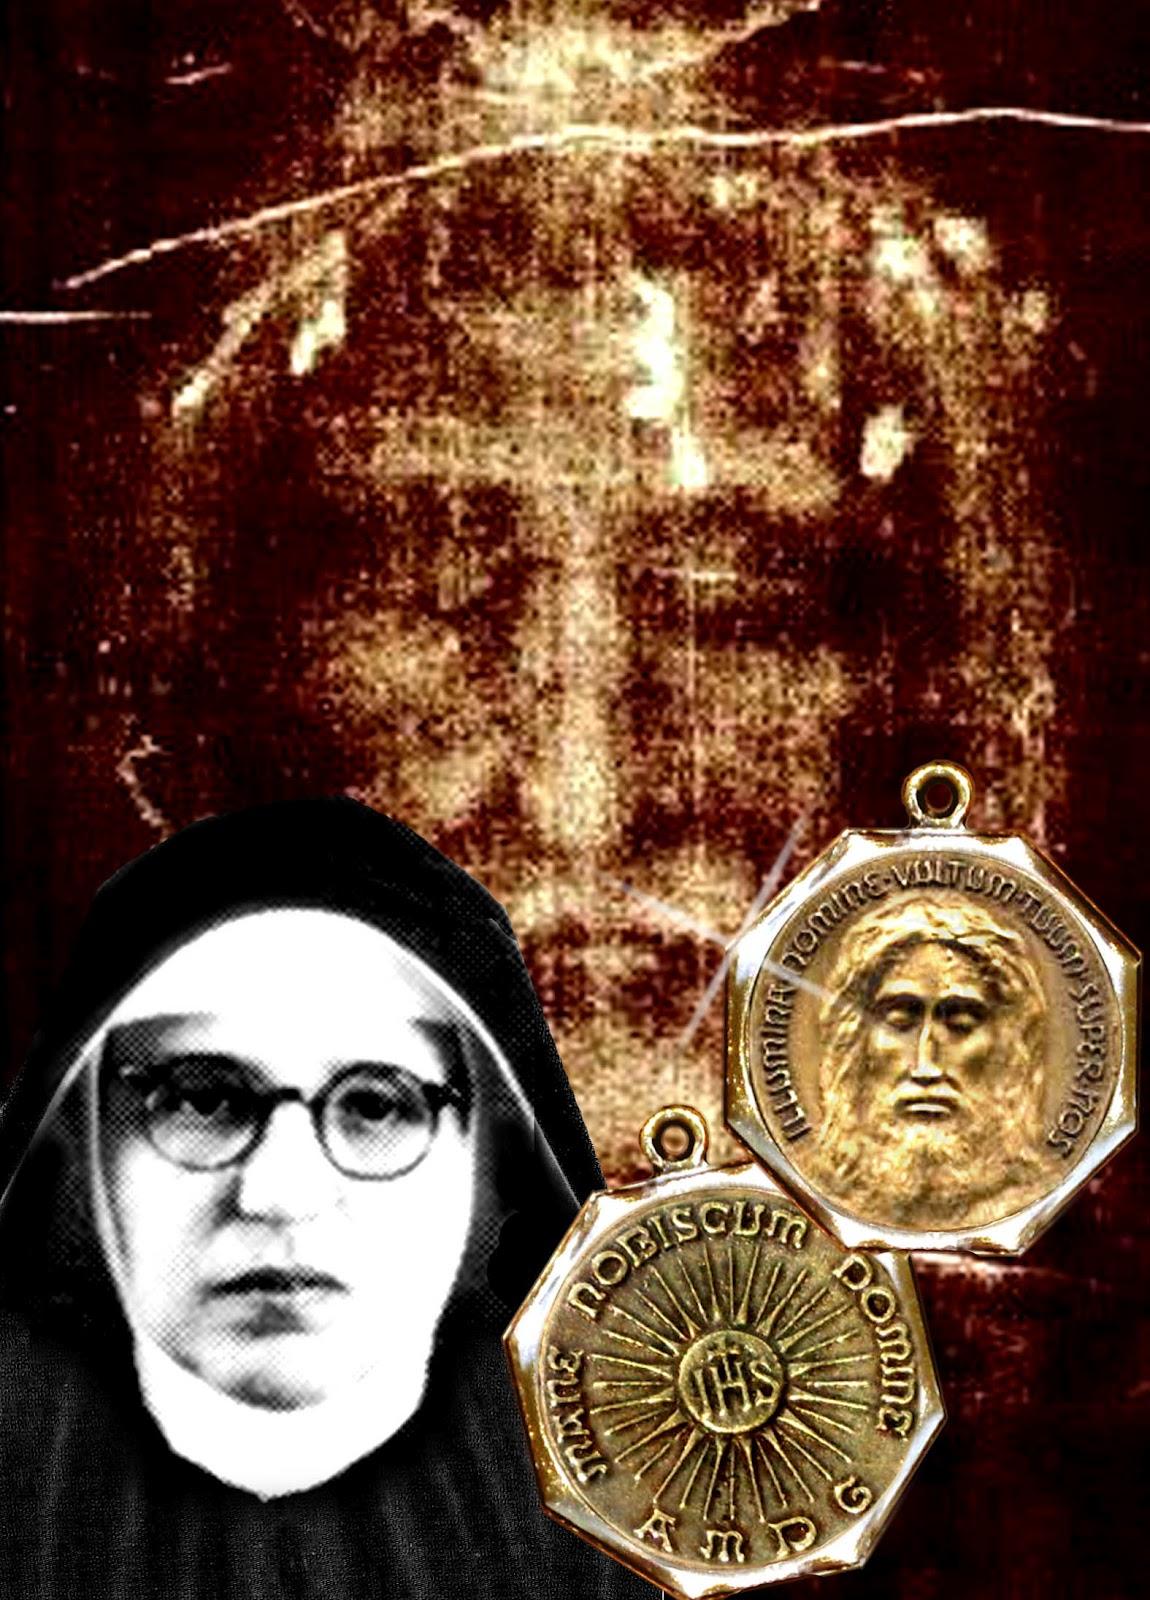 medalhasagradaface2a.jpg